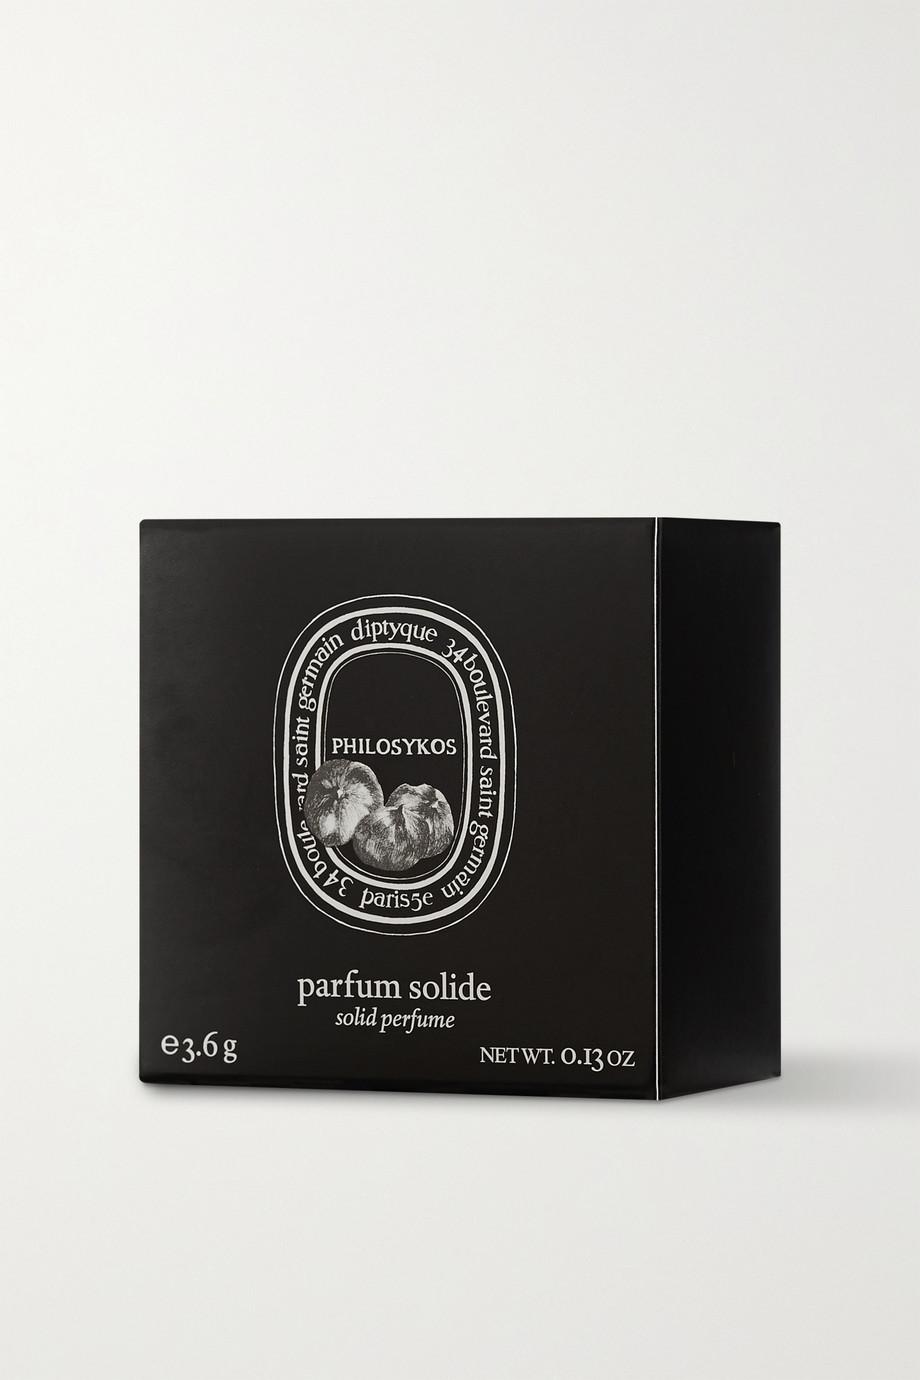 Diptyque Philosykos Solid Perfume – Feigenblatt, Frucht & Holz, 3,6 g – Cremeparfum